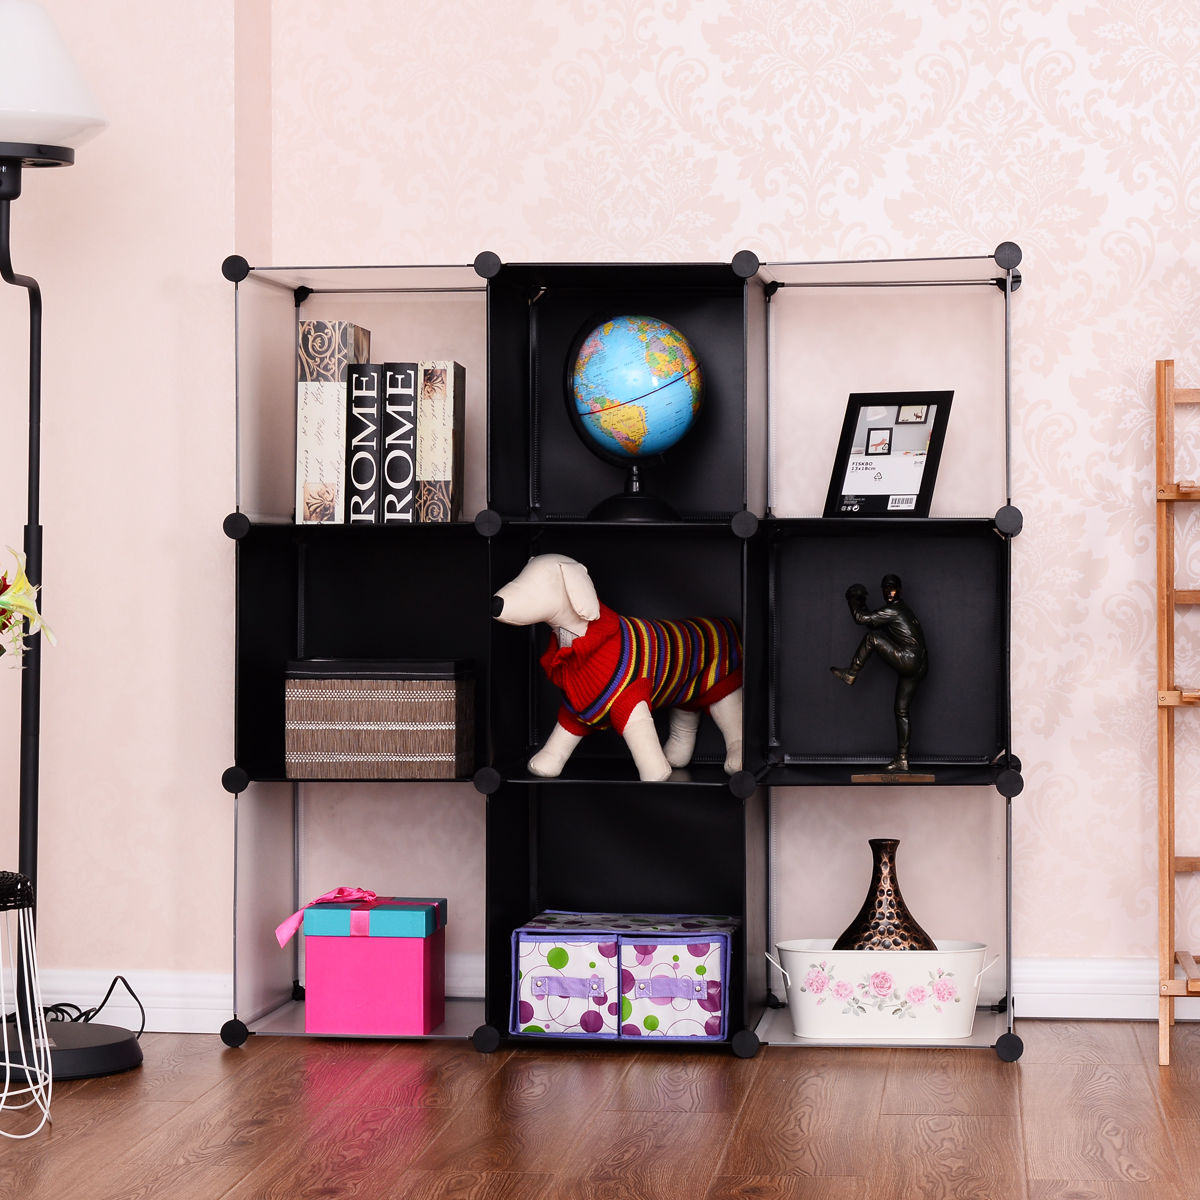 Giantex 3 Tier 9 Cubic Bookcase Living Room Storage Cabinet Shelf Modern DIY Closet Organizer Office Home Furniture HW54798